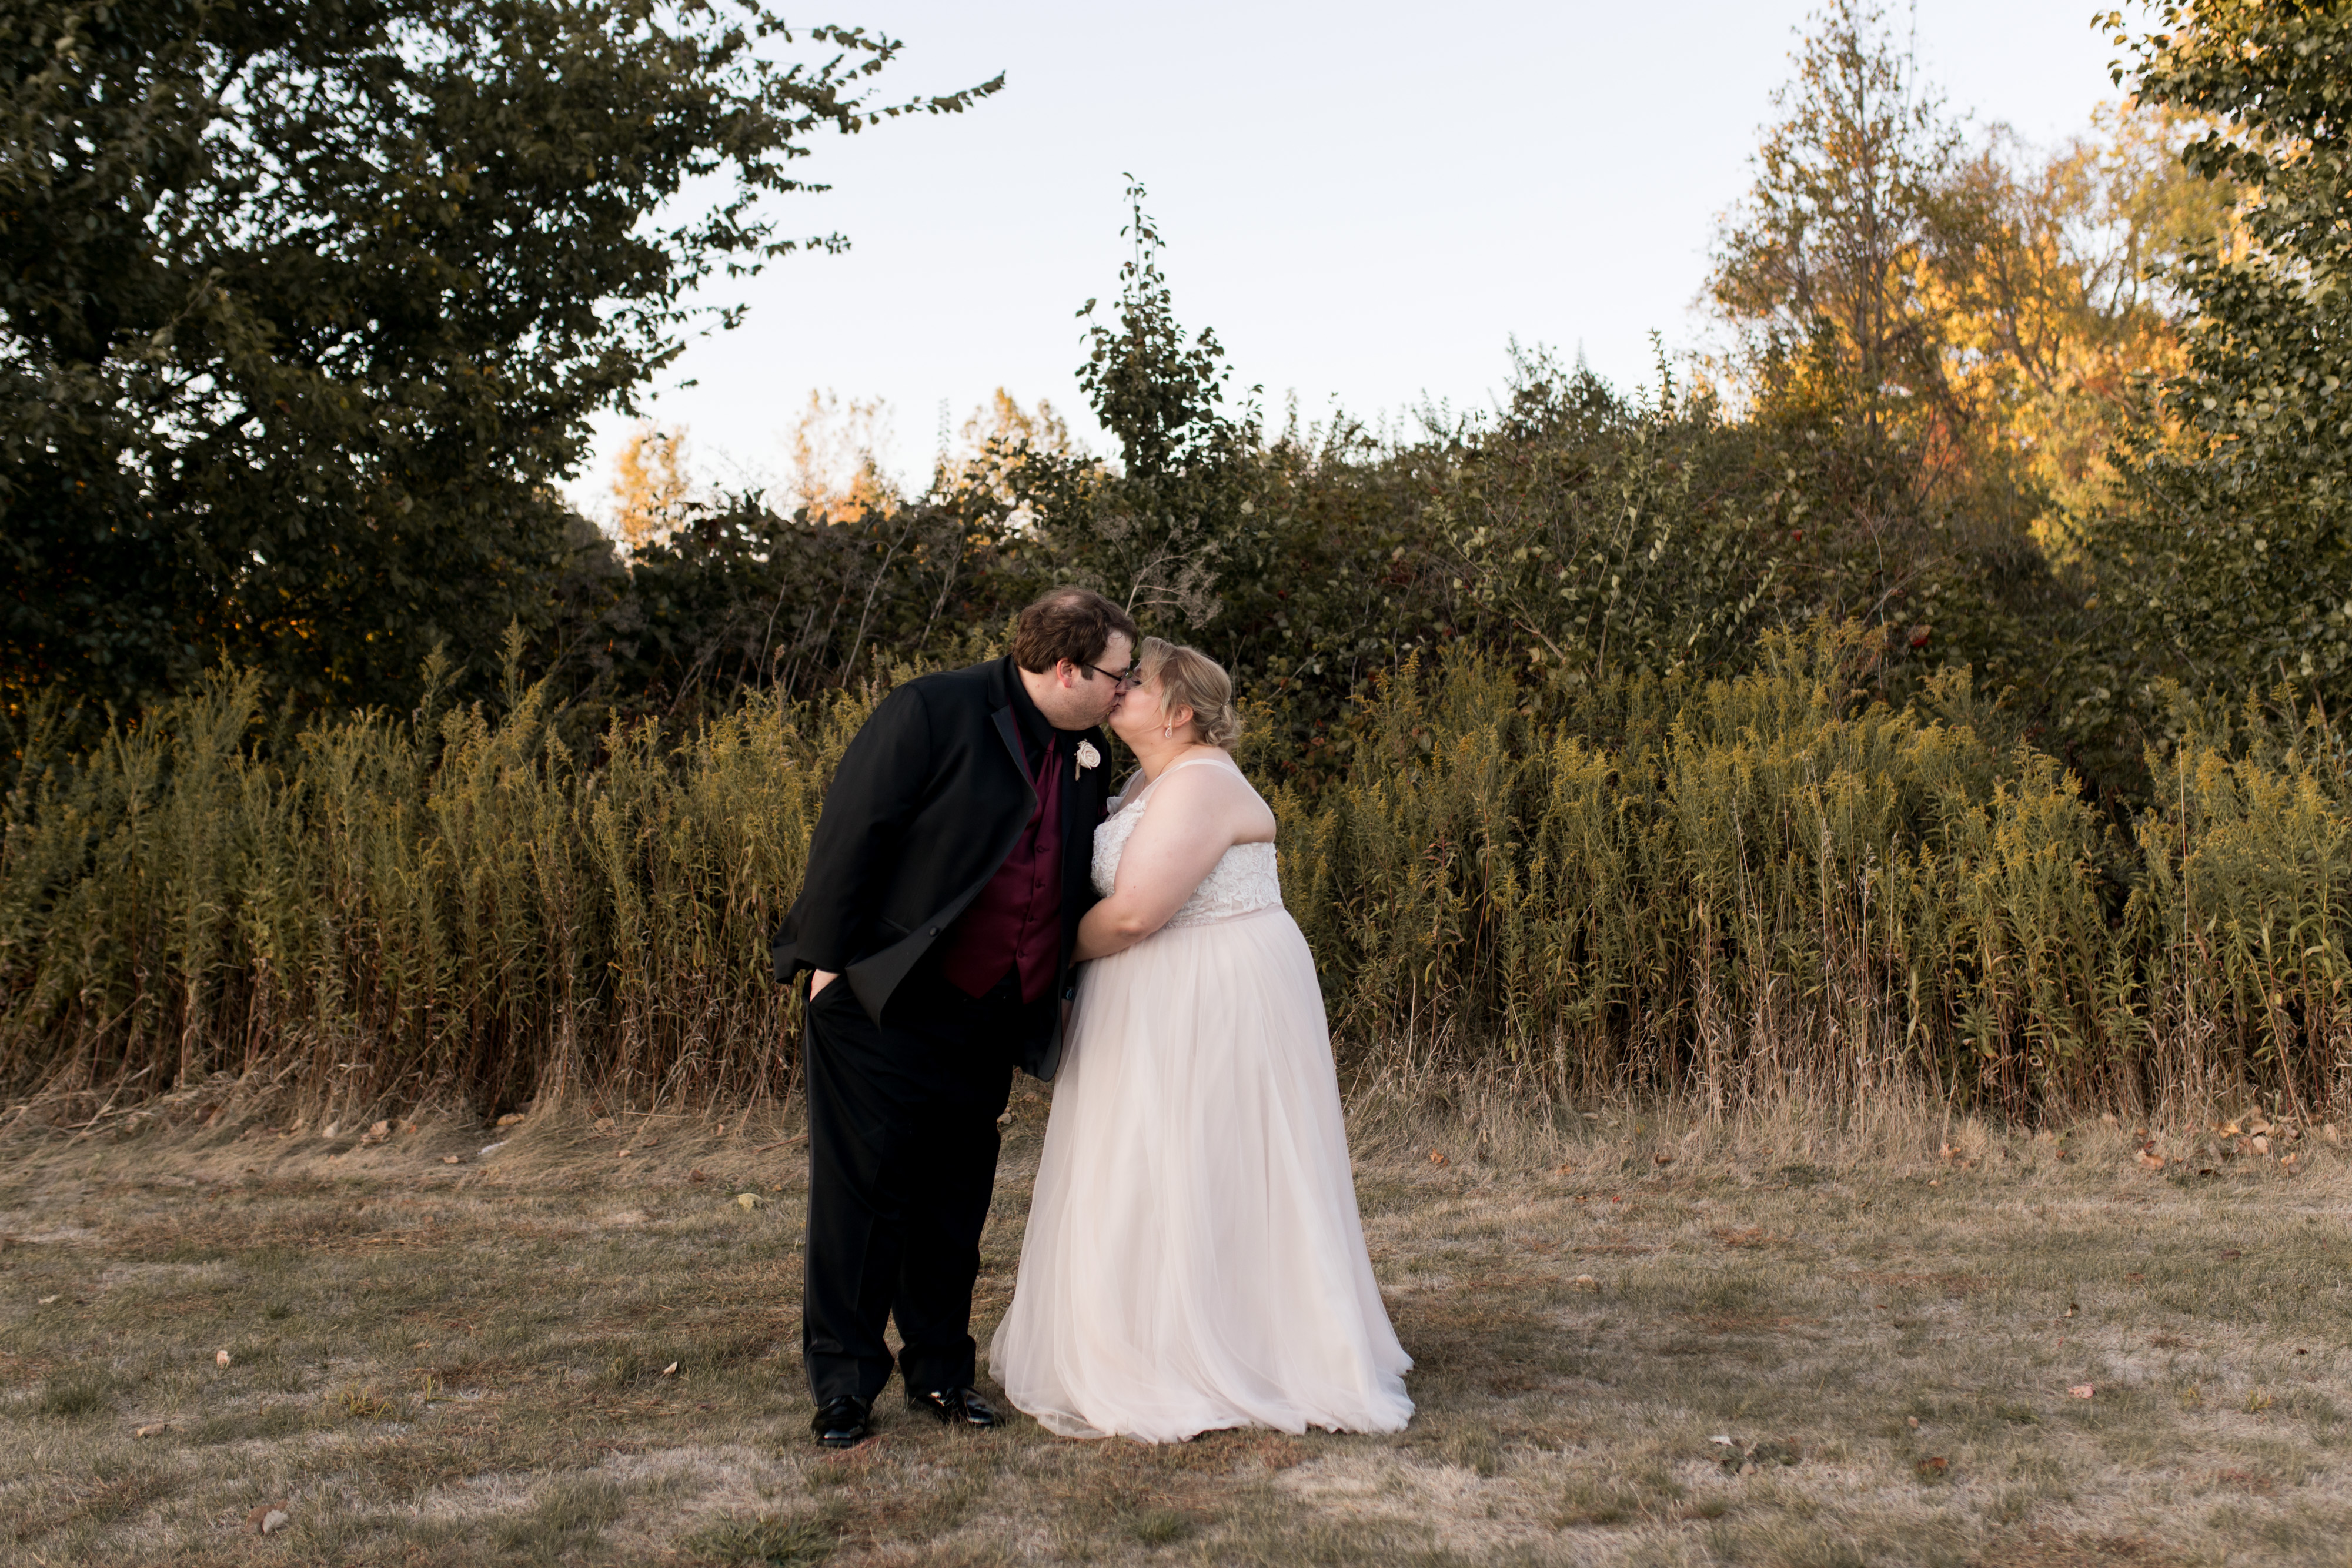 bride and groom wedding photos during sunset in Kokomo Indiana